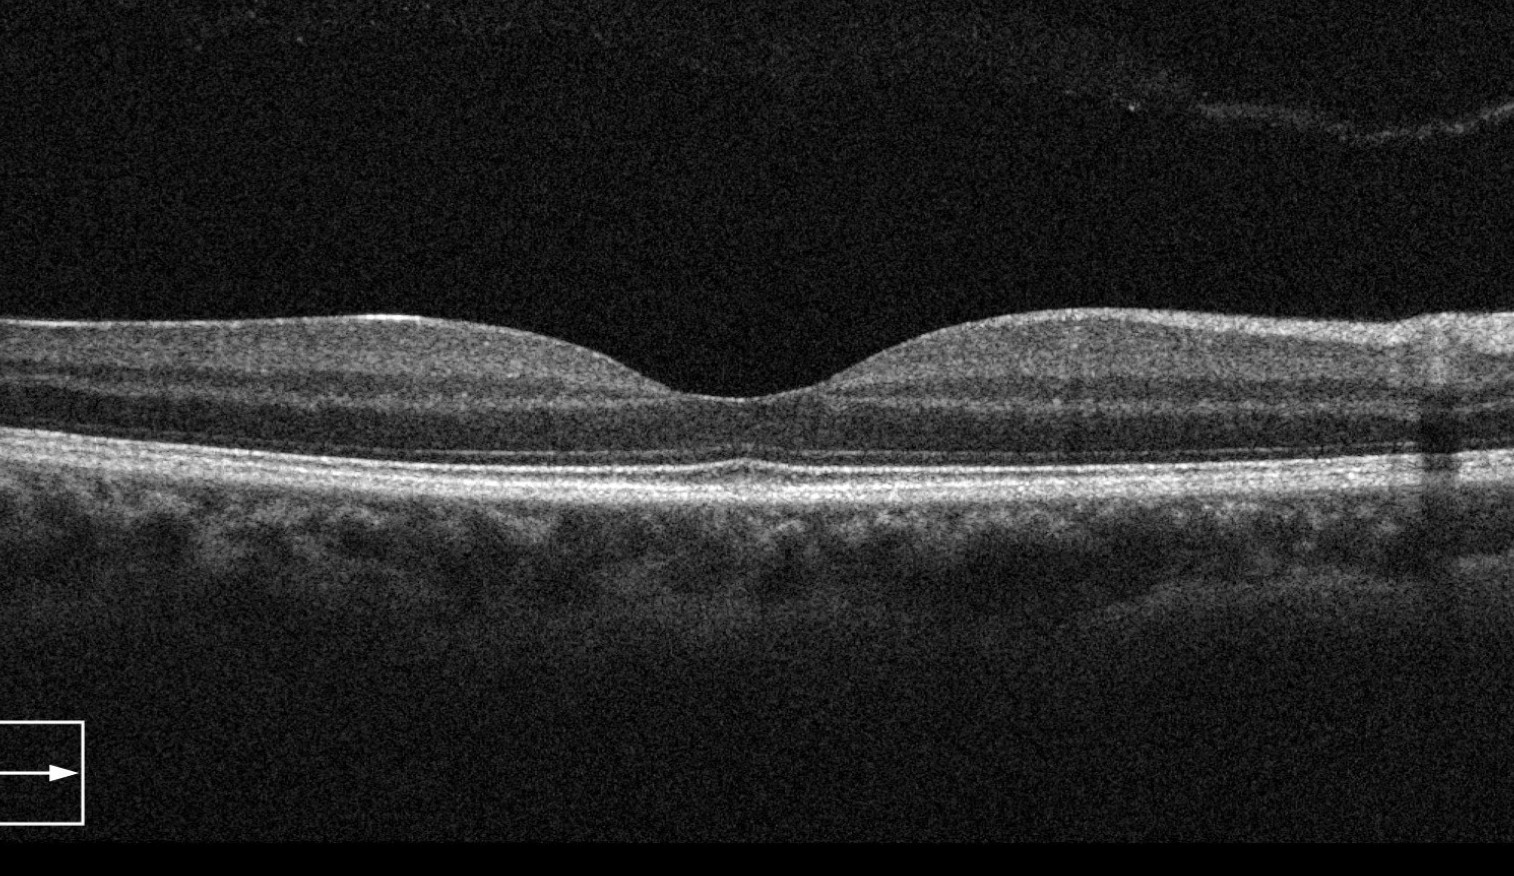 OCT Optical Coherence Tomography Edmonton